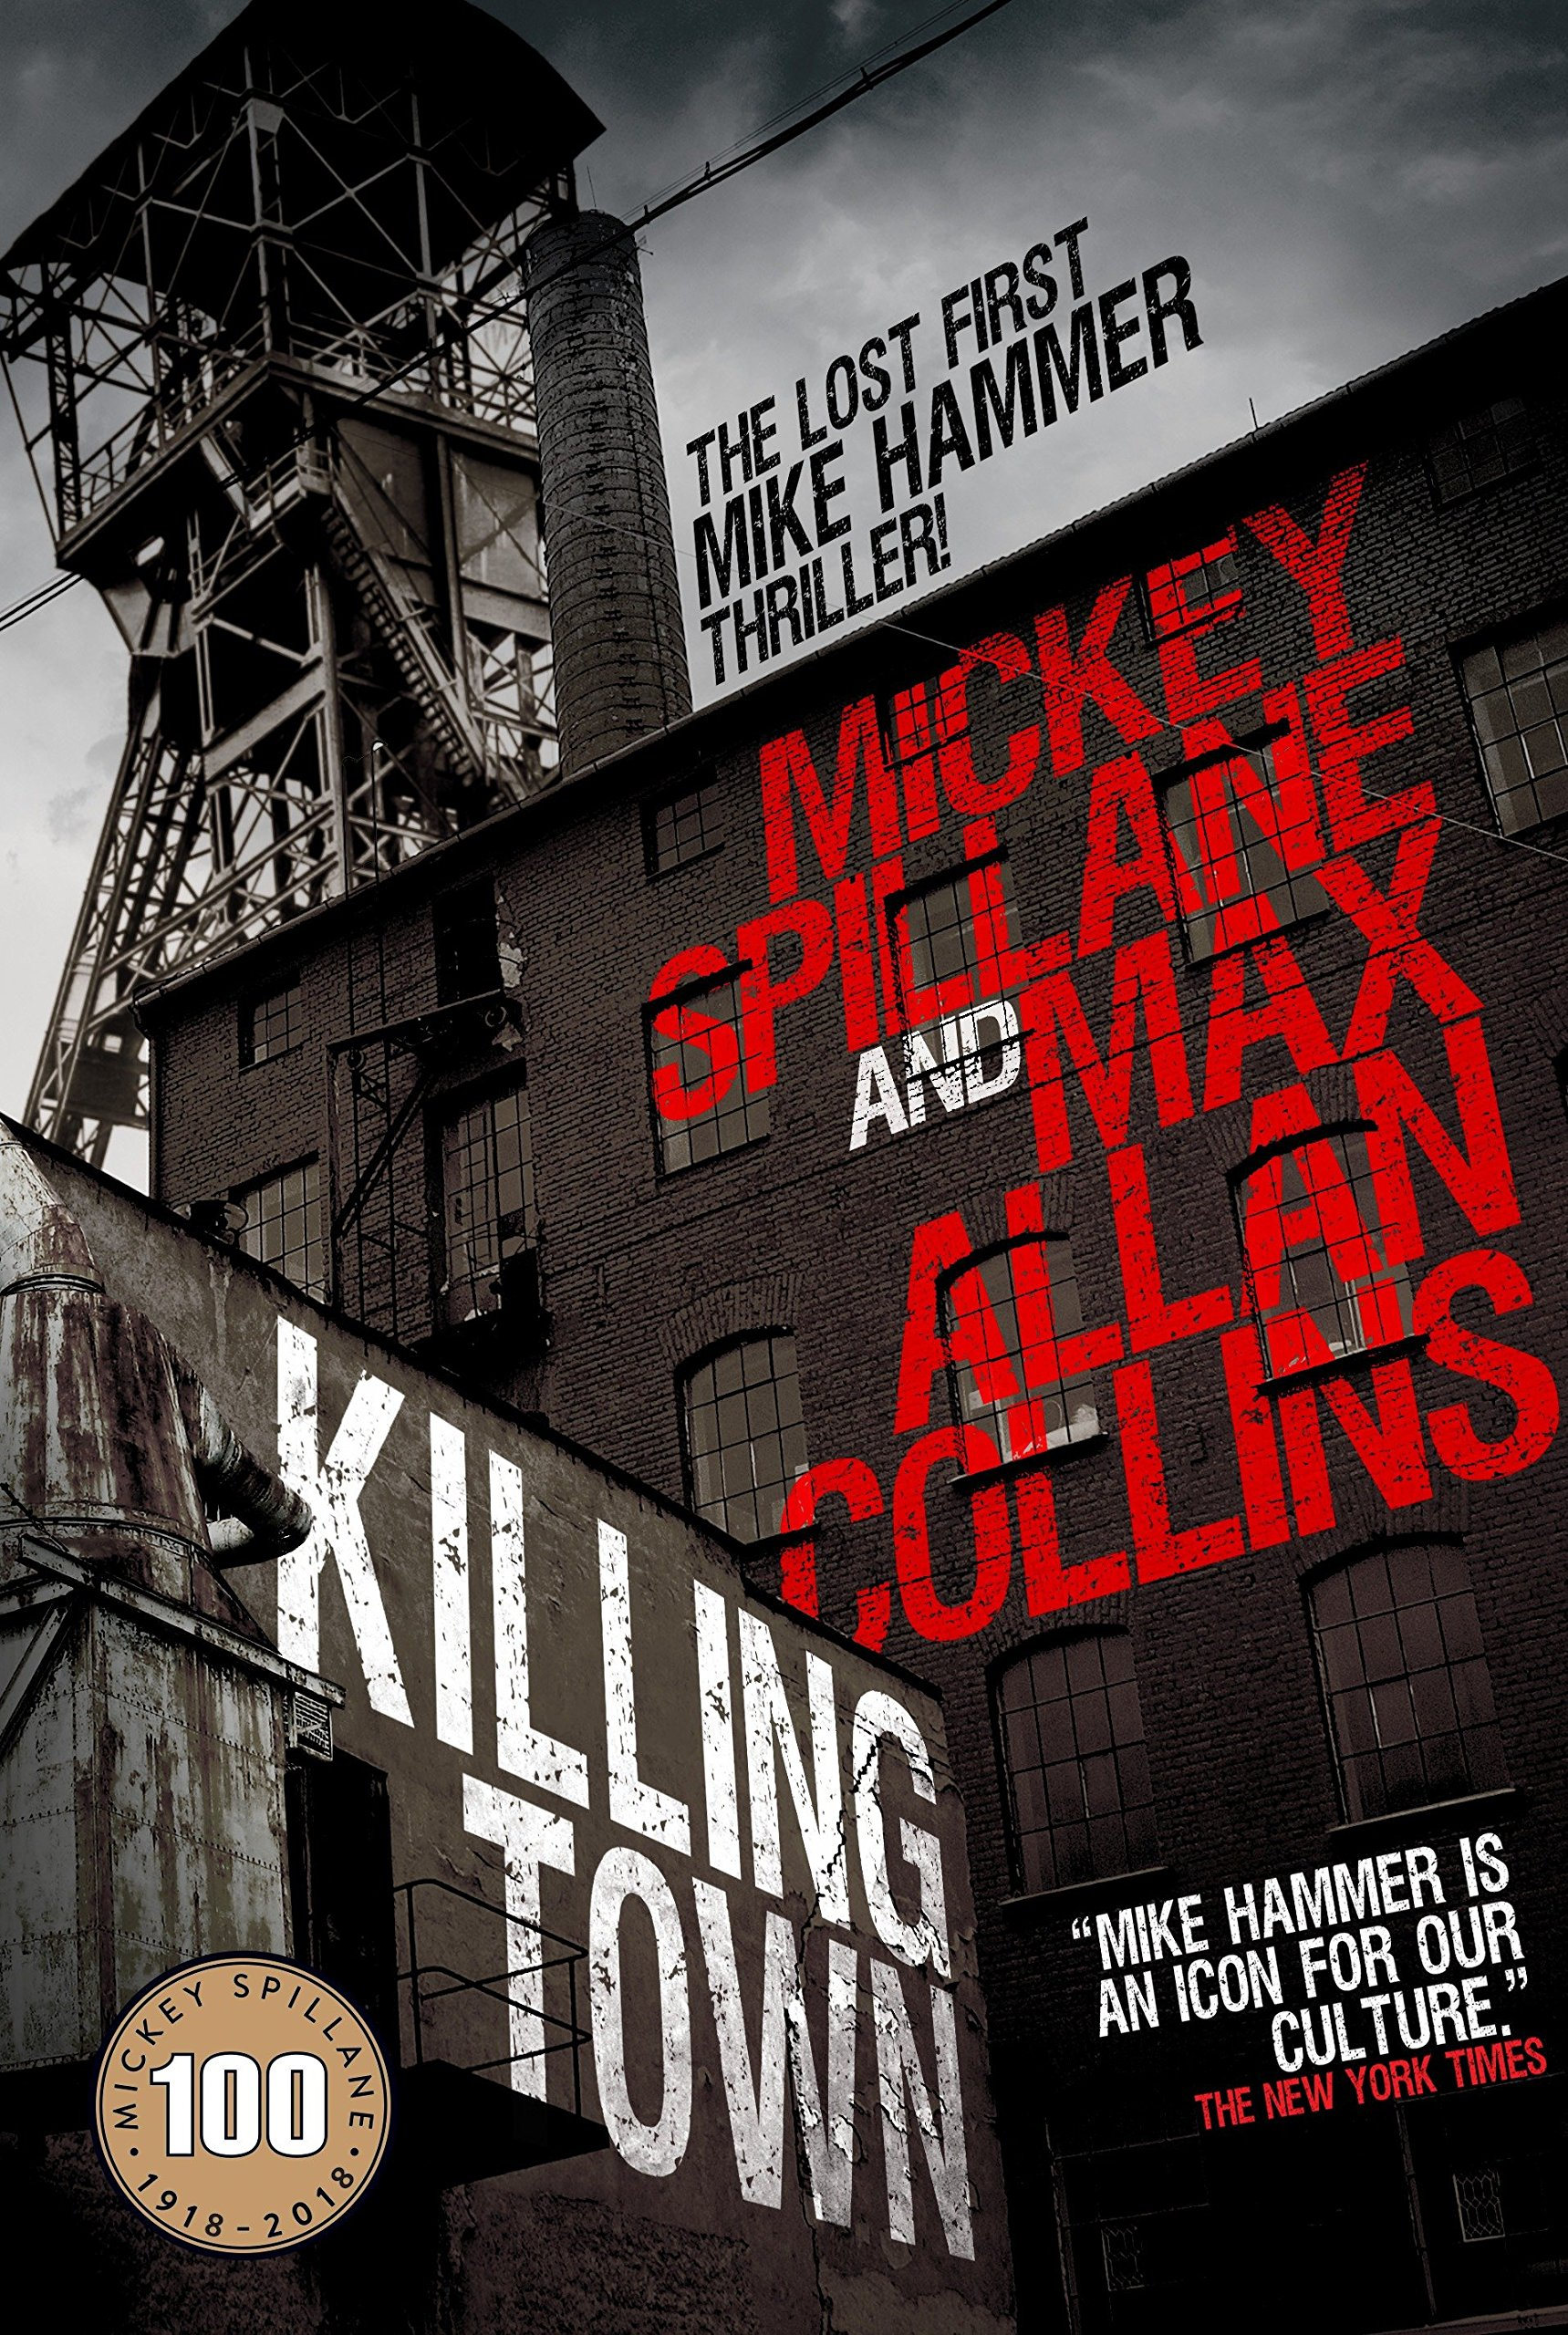 Mike Hammer Mickey Spillane Killing Town Max Allan Collins